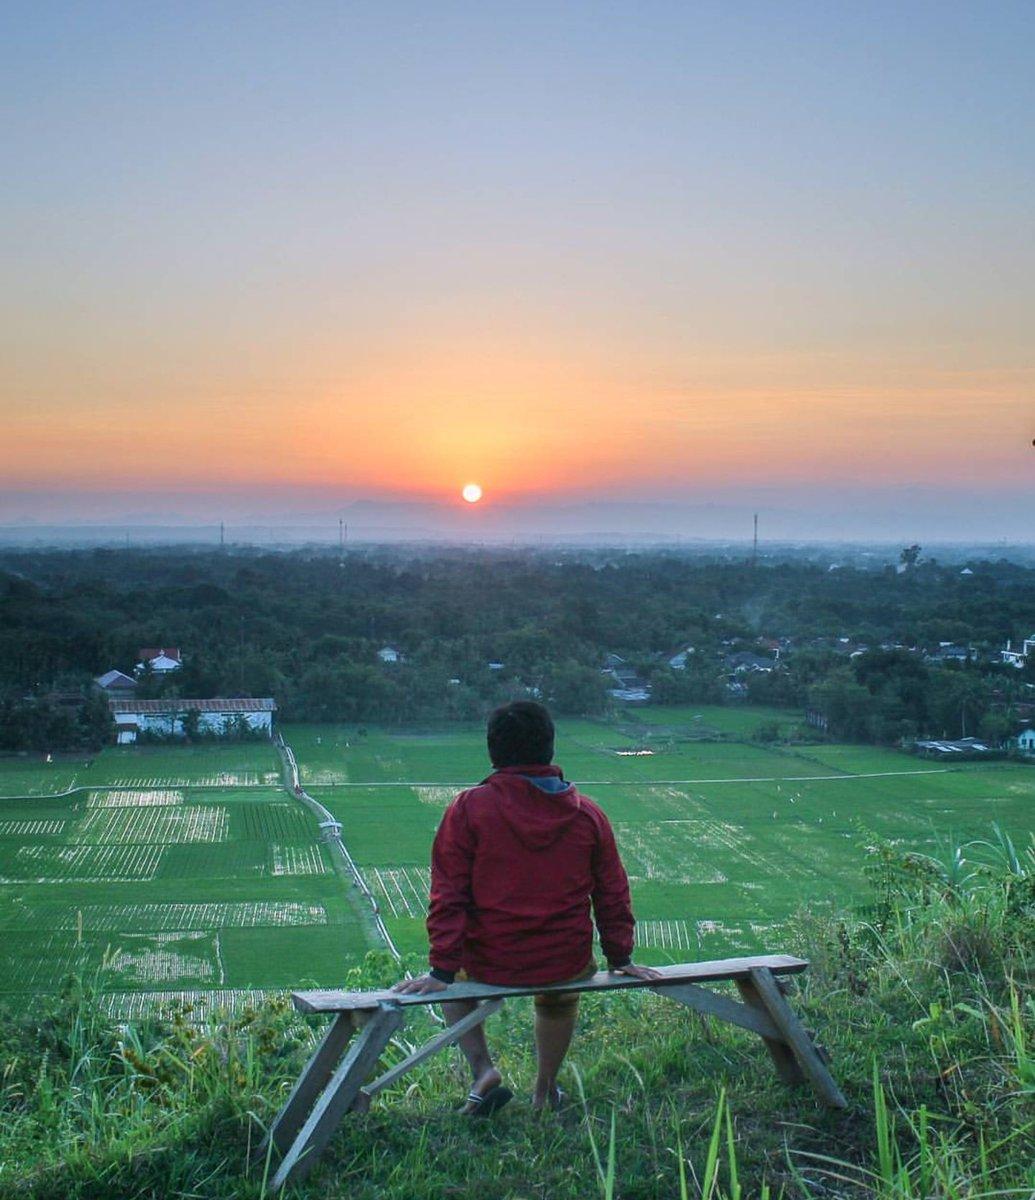 Jogja Yogyakarta בטוויטר Syahdu O Sunset Di Puncak Gebang Pleret Bantul Yogyakarta Jogja Photo By At Gunawanwicaksana28 Ig